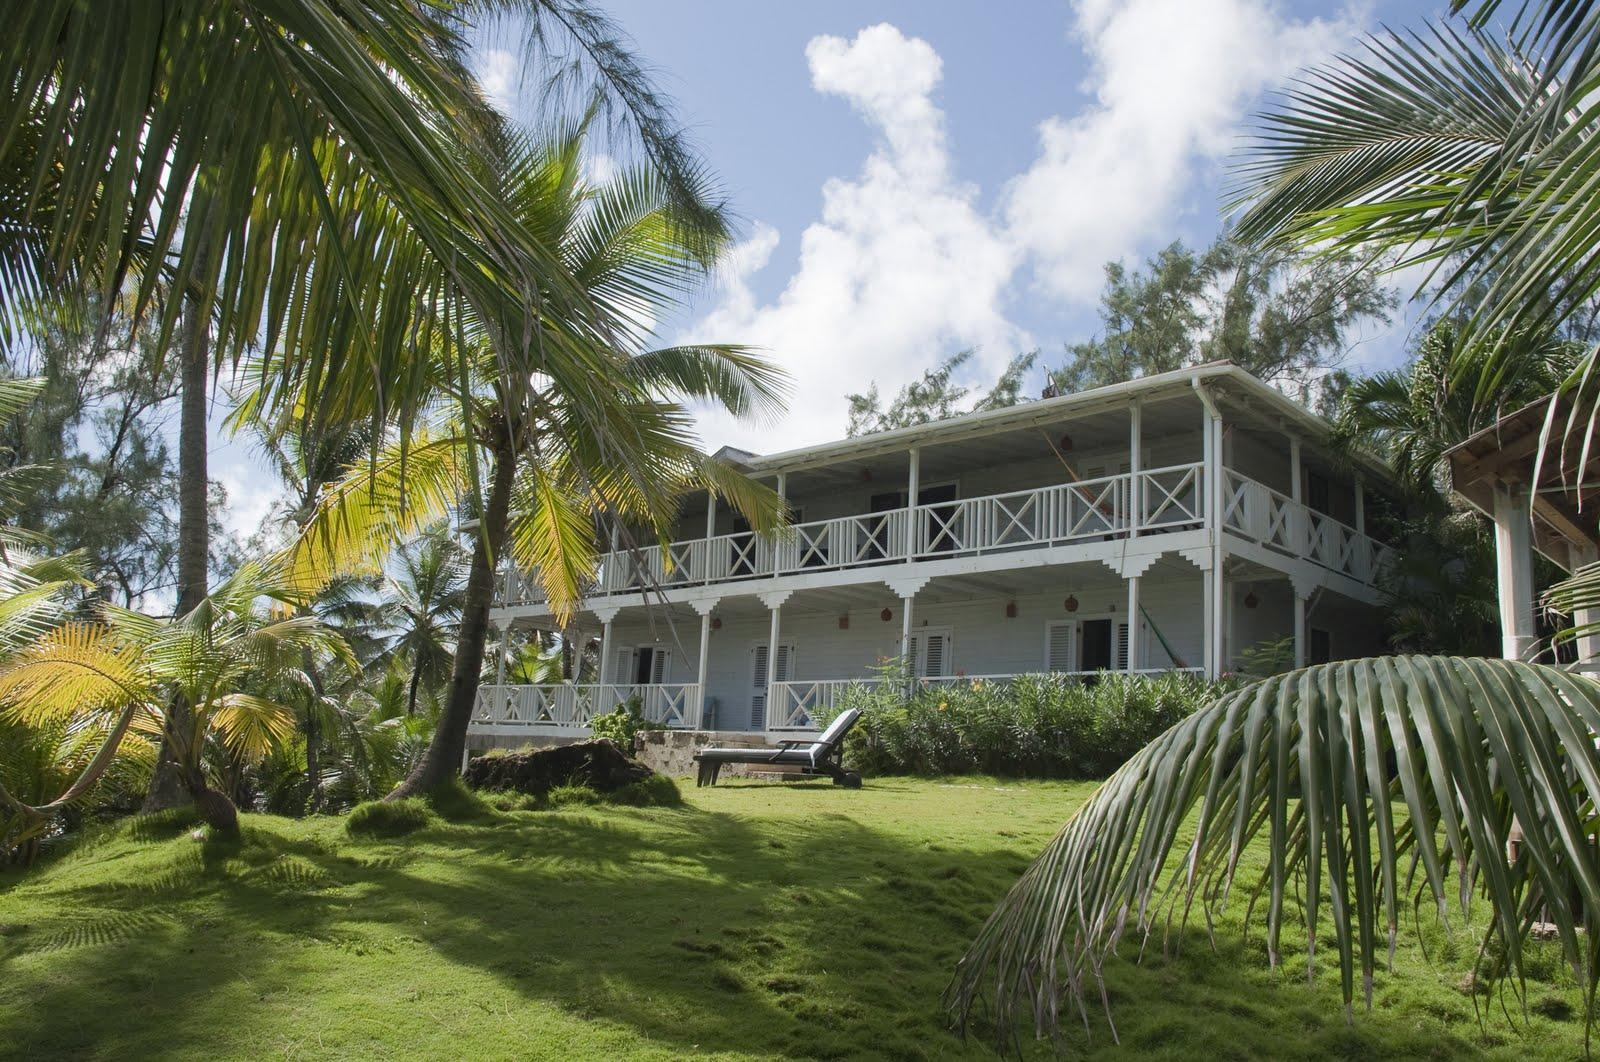 sea-u guest house | caribbean stay